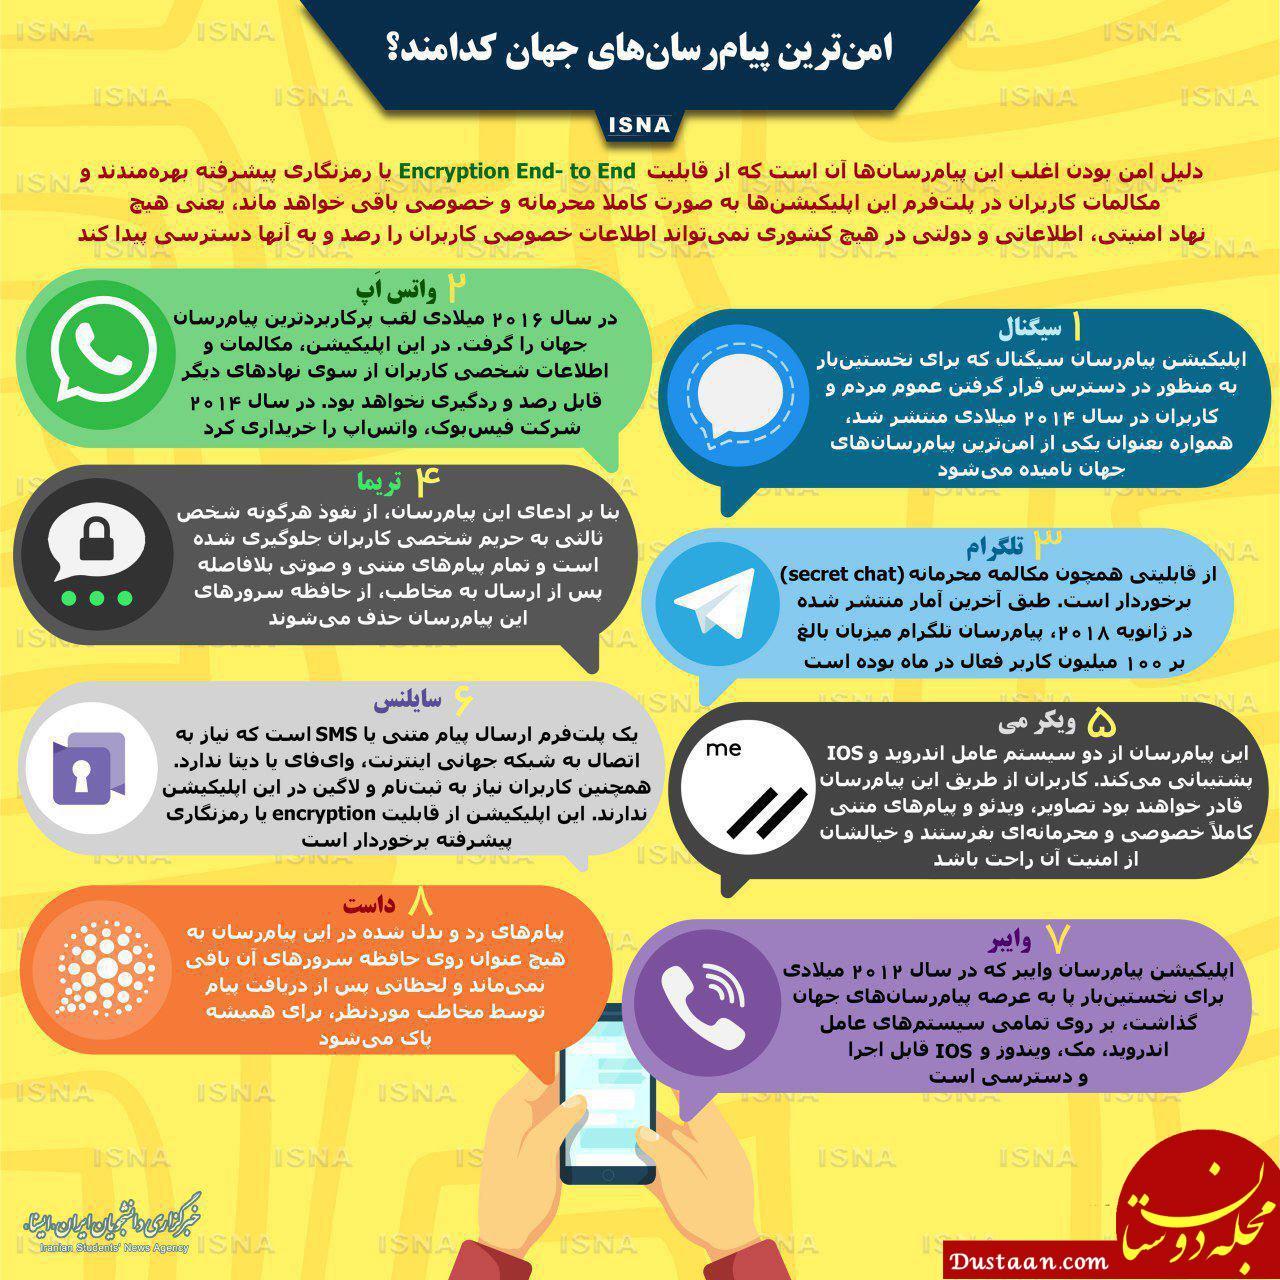 www.dustaan.com امن ترین پیام رسان های جهان کدامند؟ +اینفوگرافیک